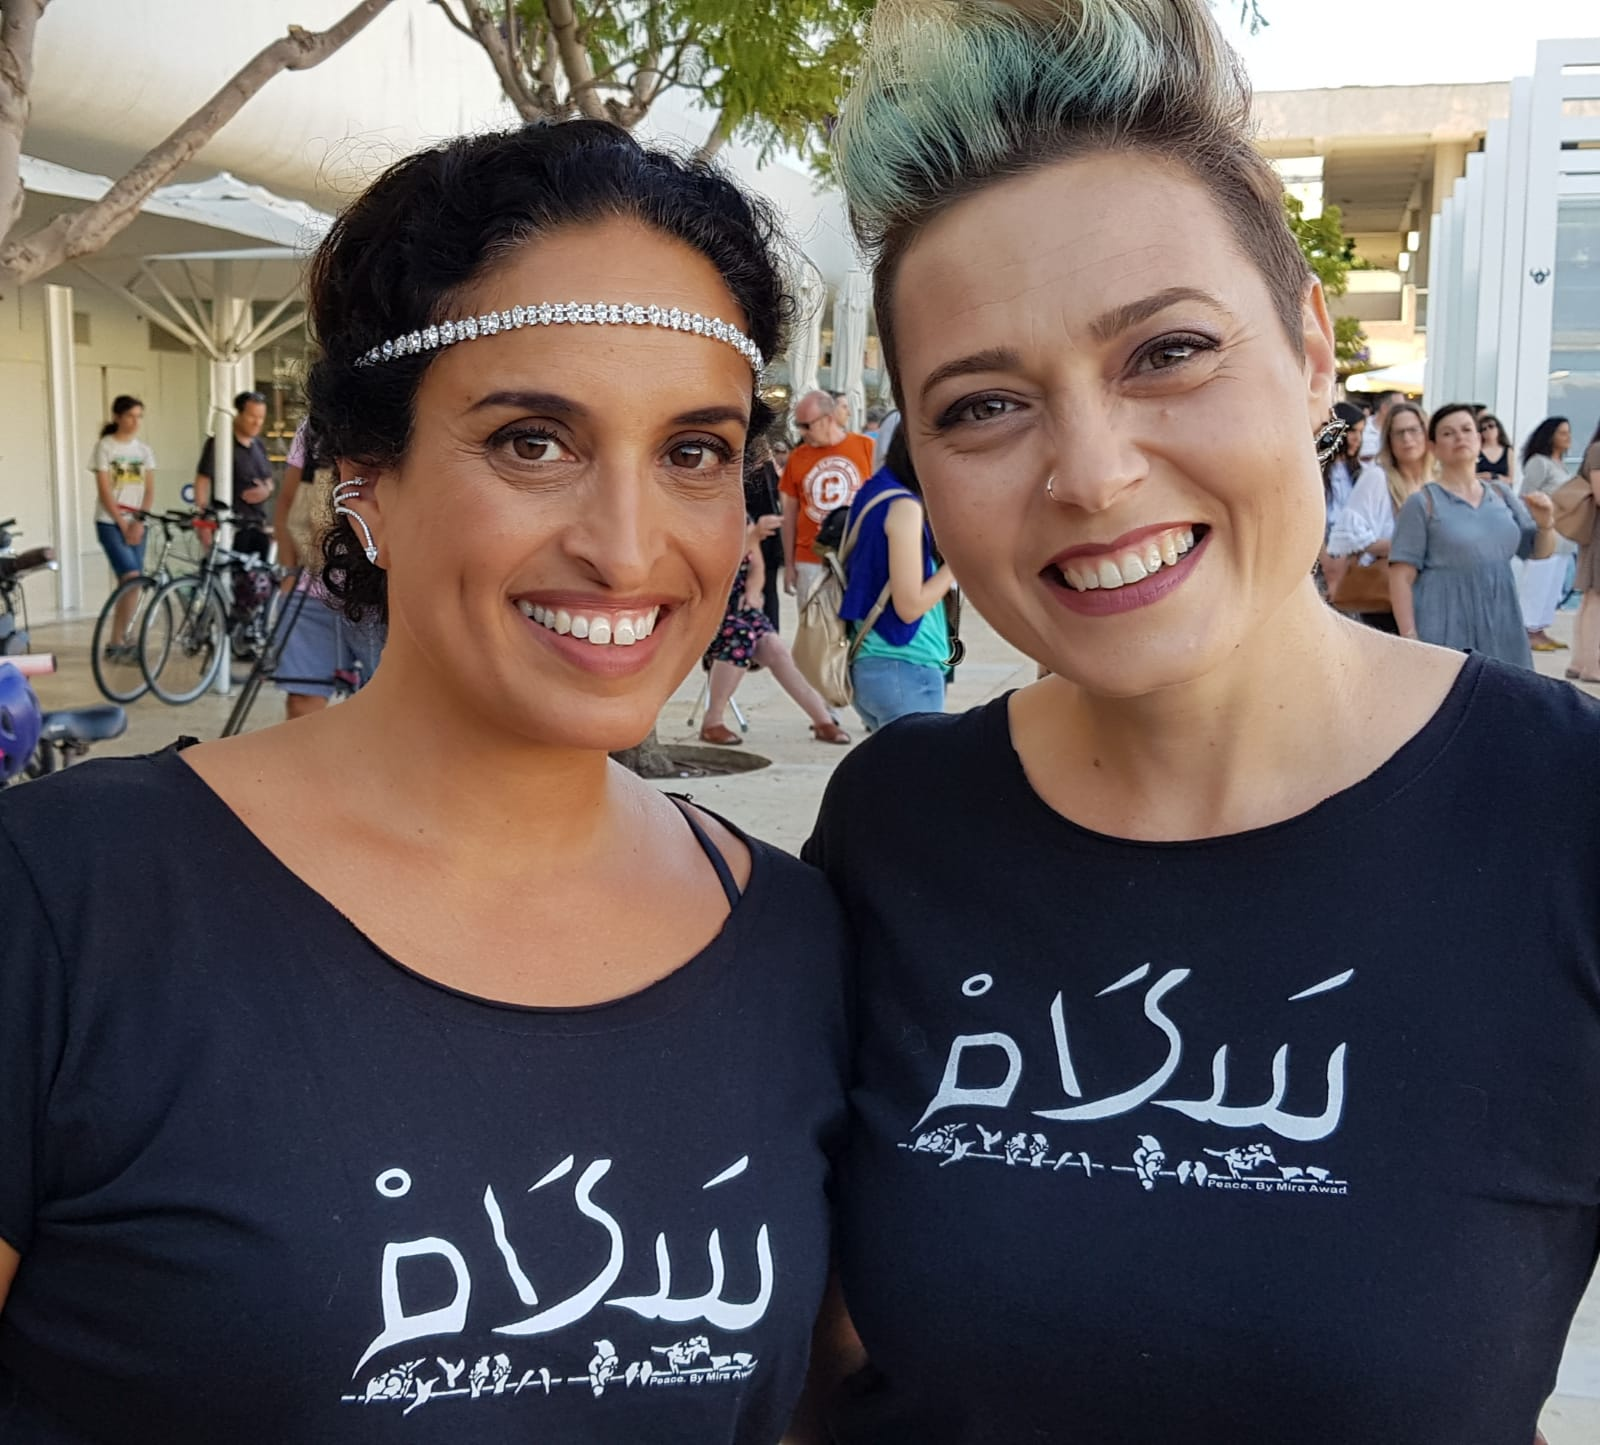 Noa (Achinoam Nini) & Mira Awad